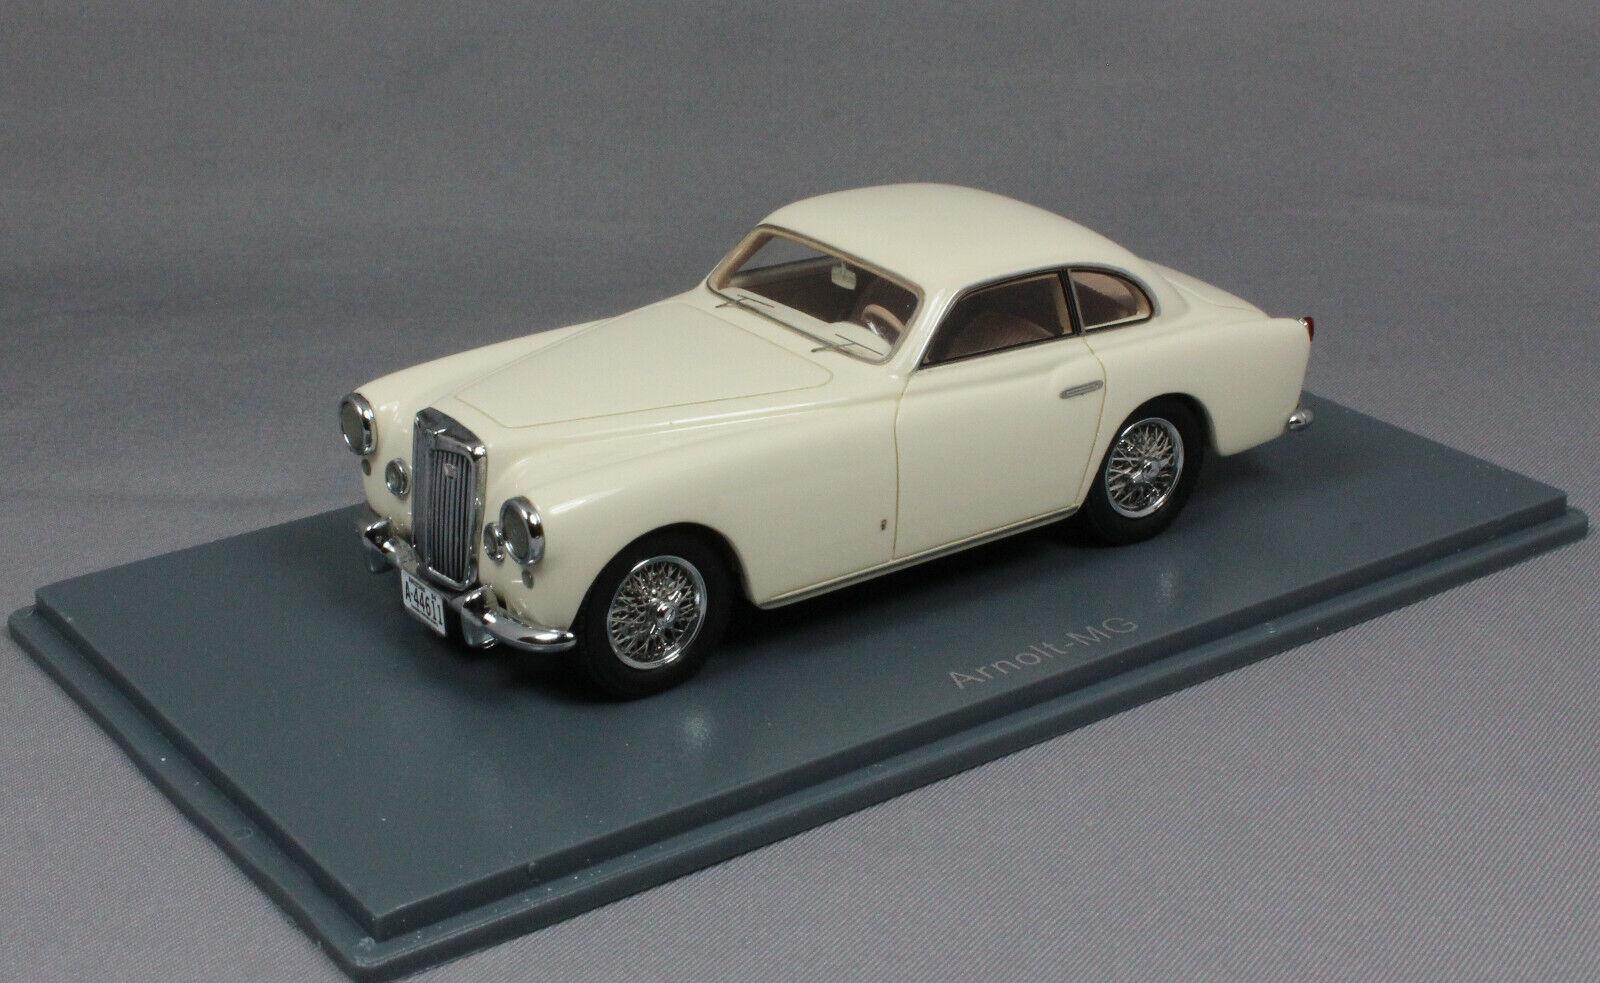 Neo Models Arnolt MG  in blanc 1953 44611 1 43 nouveau Resin  meilleur service